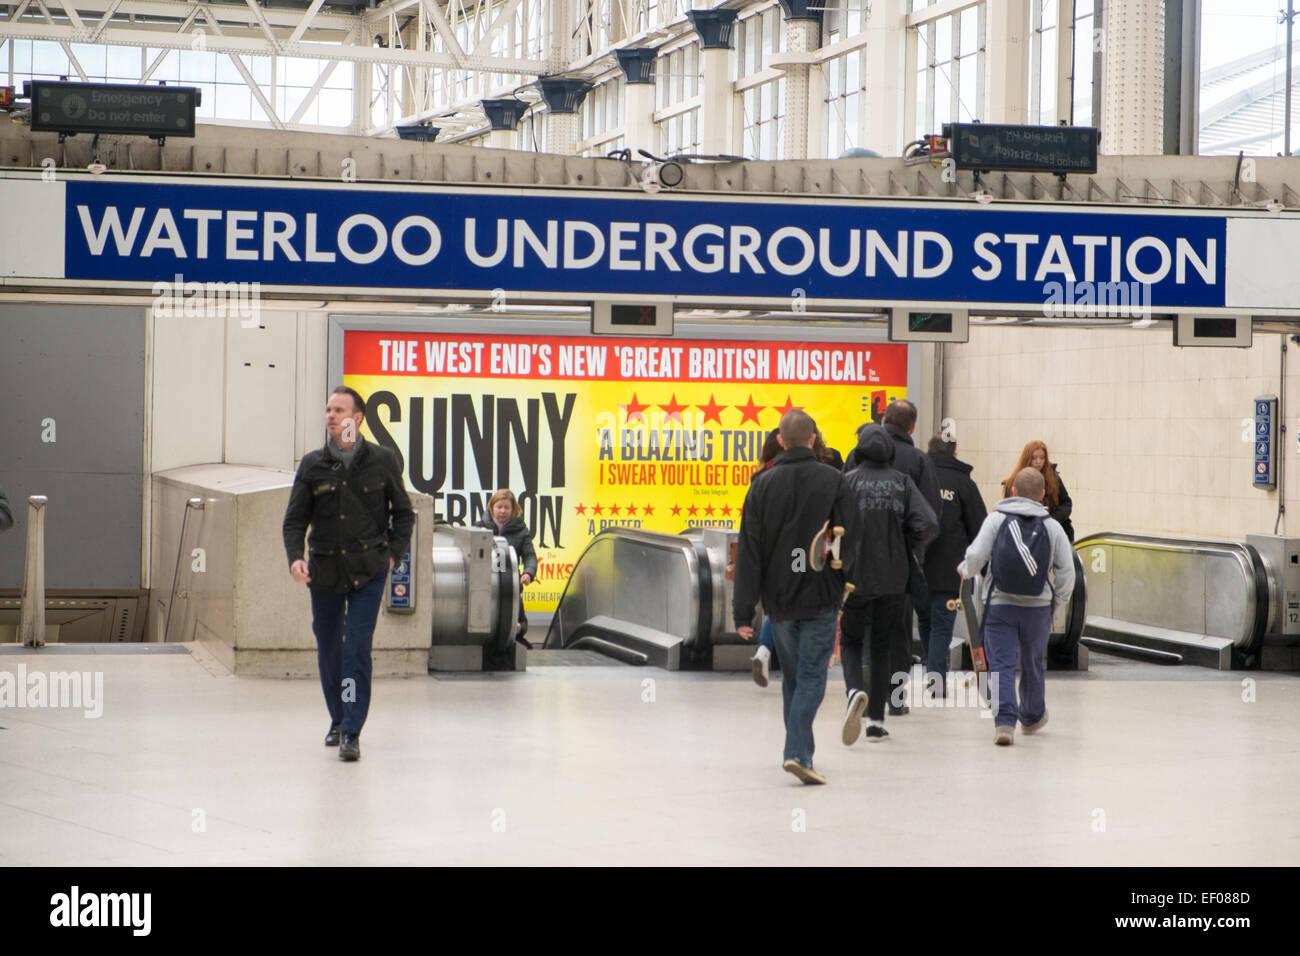 passengers entering london underground station at waterloo,london,england - Stock Image